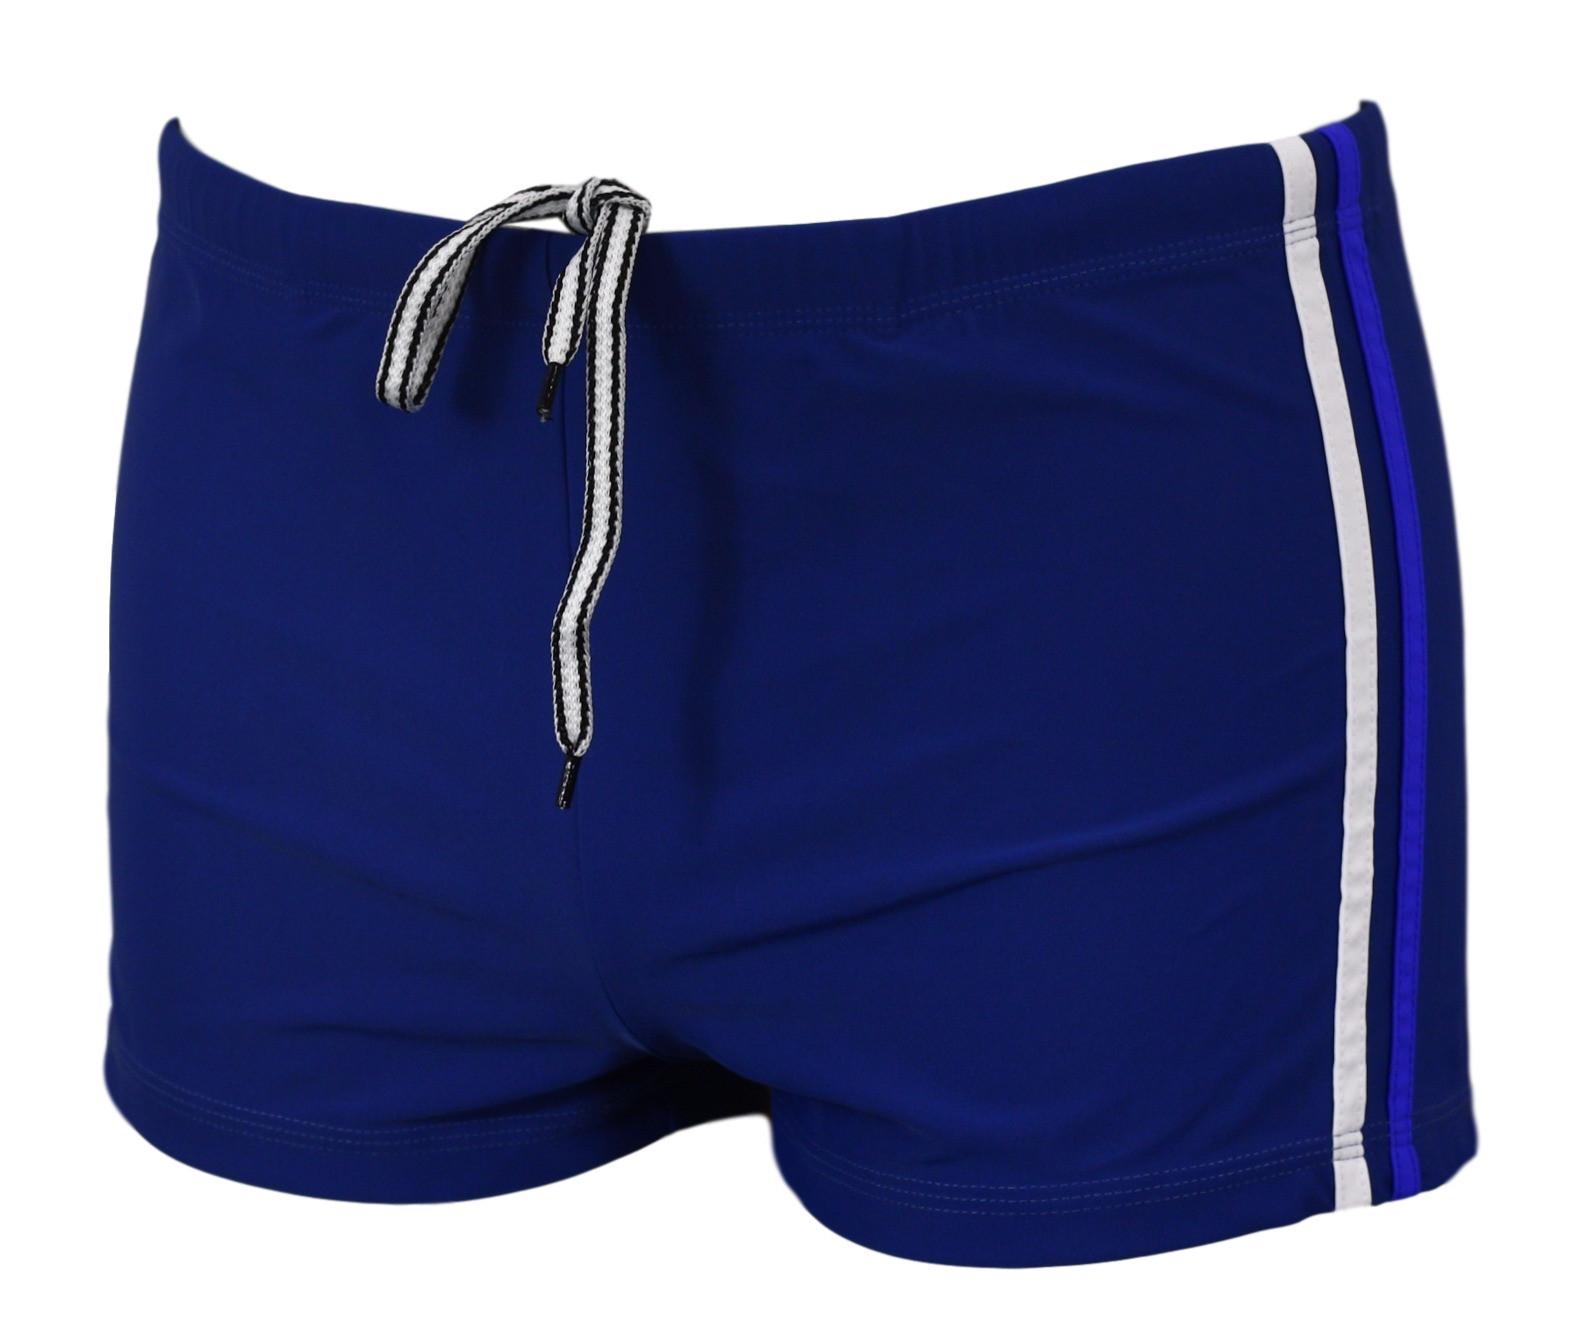 Pánské plavky 1087 - Gemini Barva: modrá, Velikost: XXL